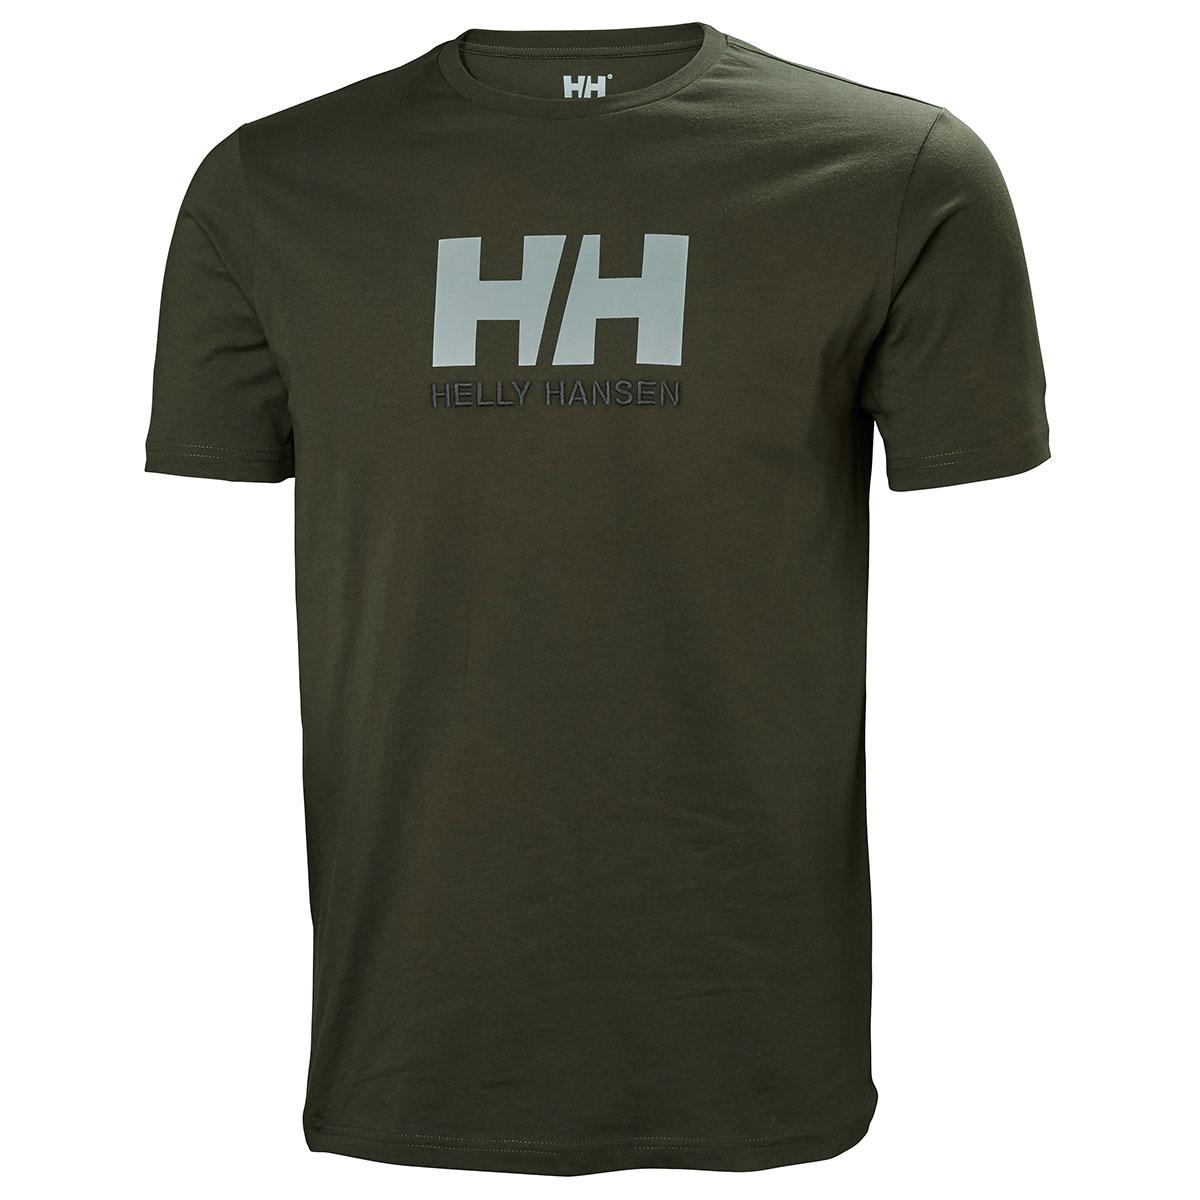 Helly-Hansen-Hommes-2018-Hh-Logo-Coton-Manches-Courtes-T-Shirt-Haut